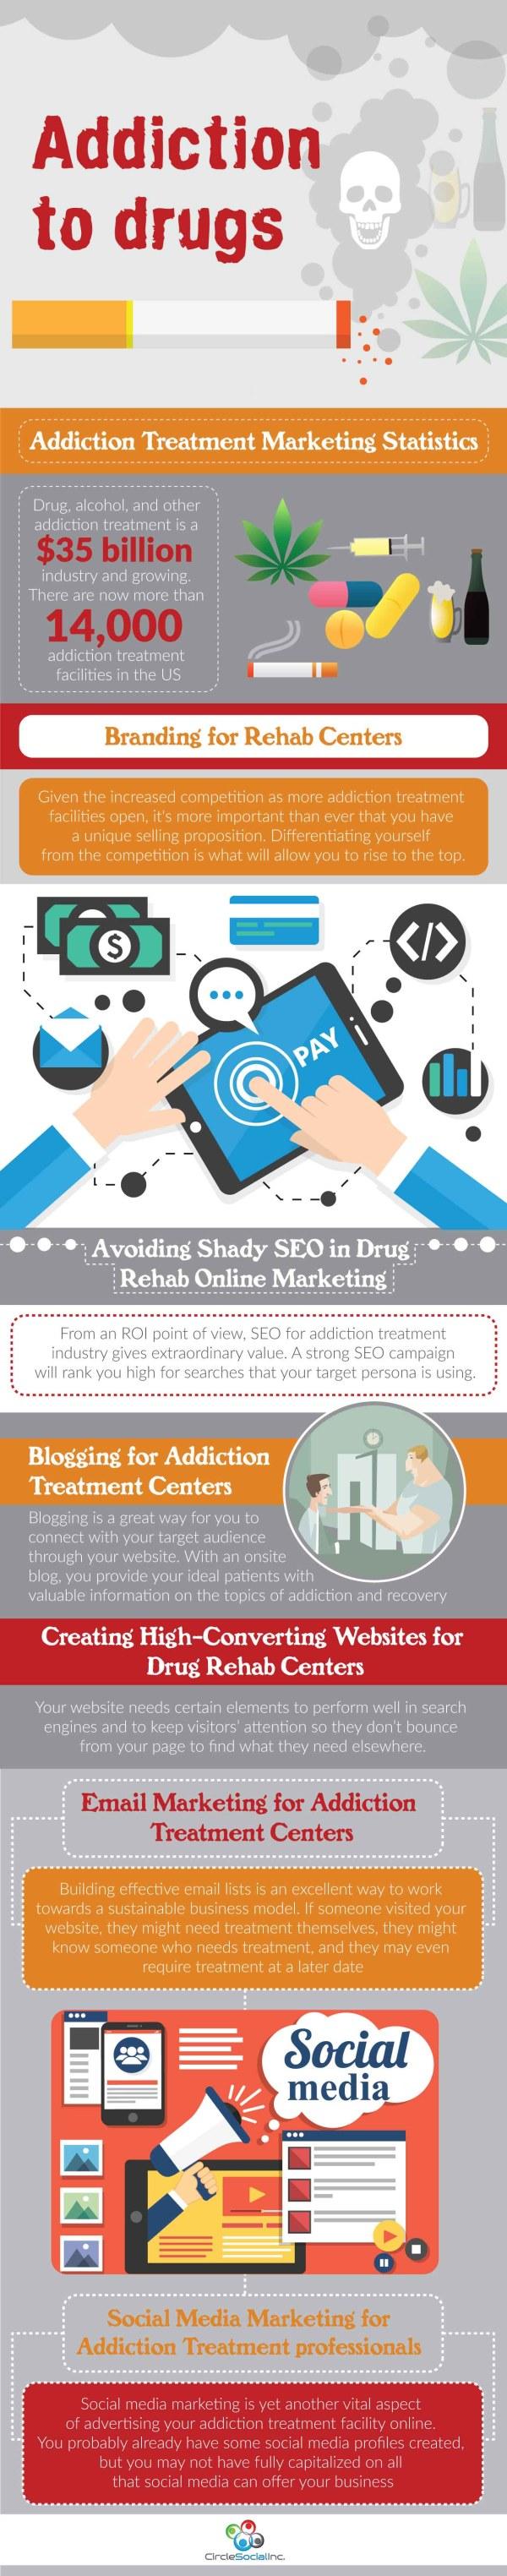 03_Addiction to drugs